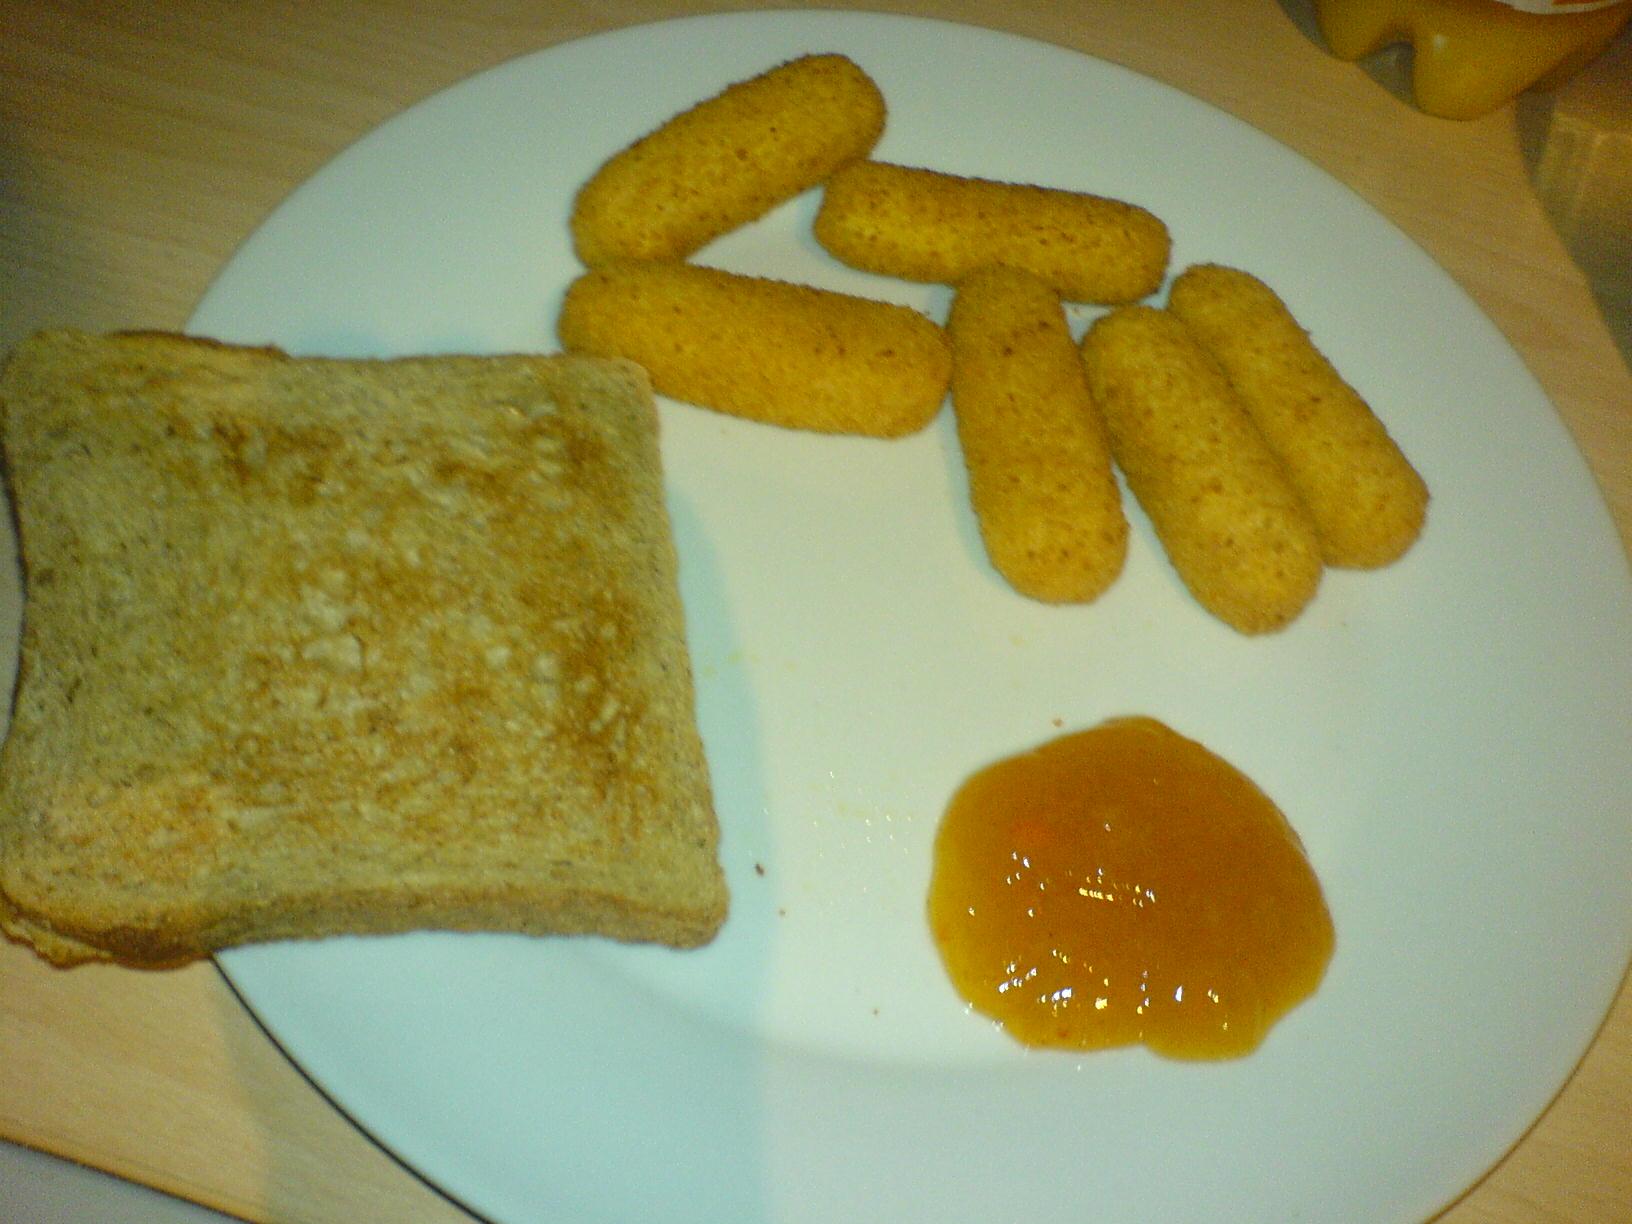 http://foodloader.net/Holz_2008-12-25_Frischkaese-Sticks_mit_Toast.jpg